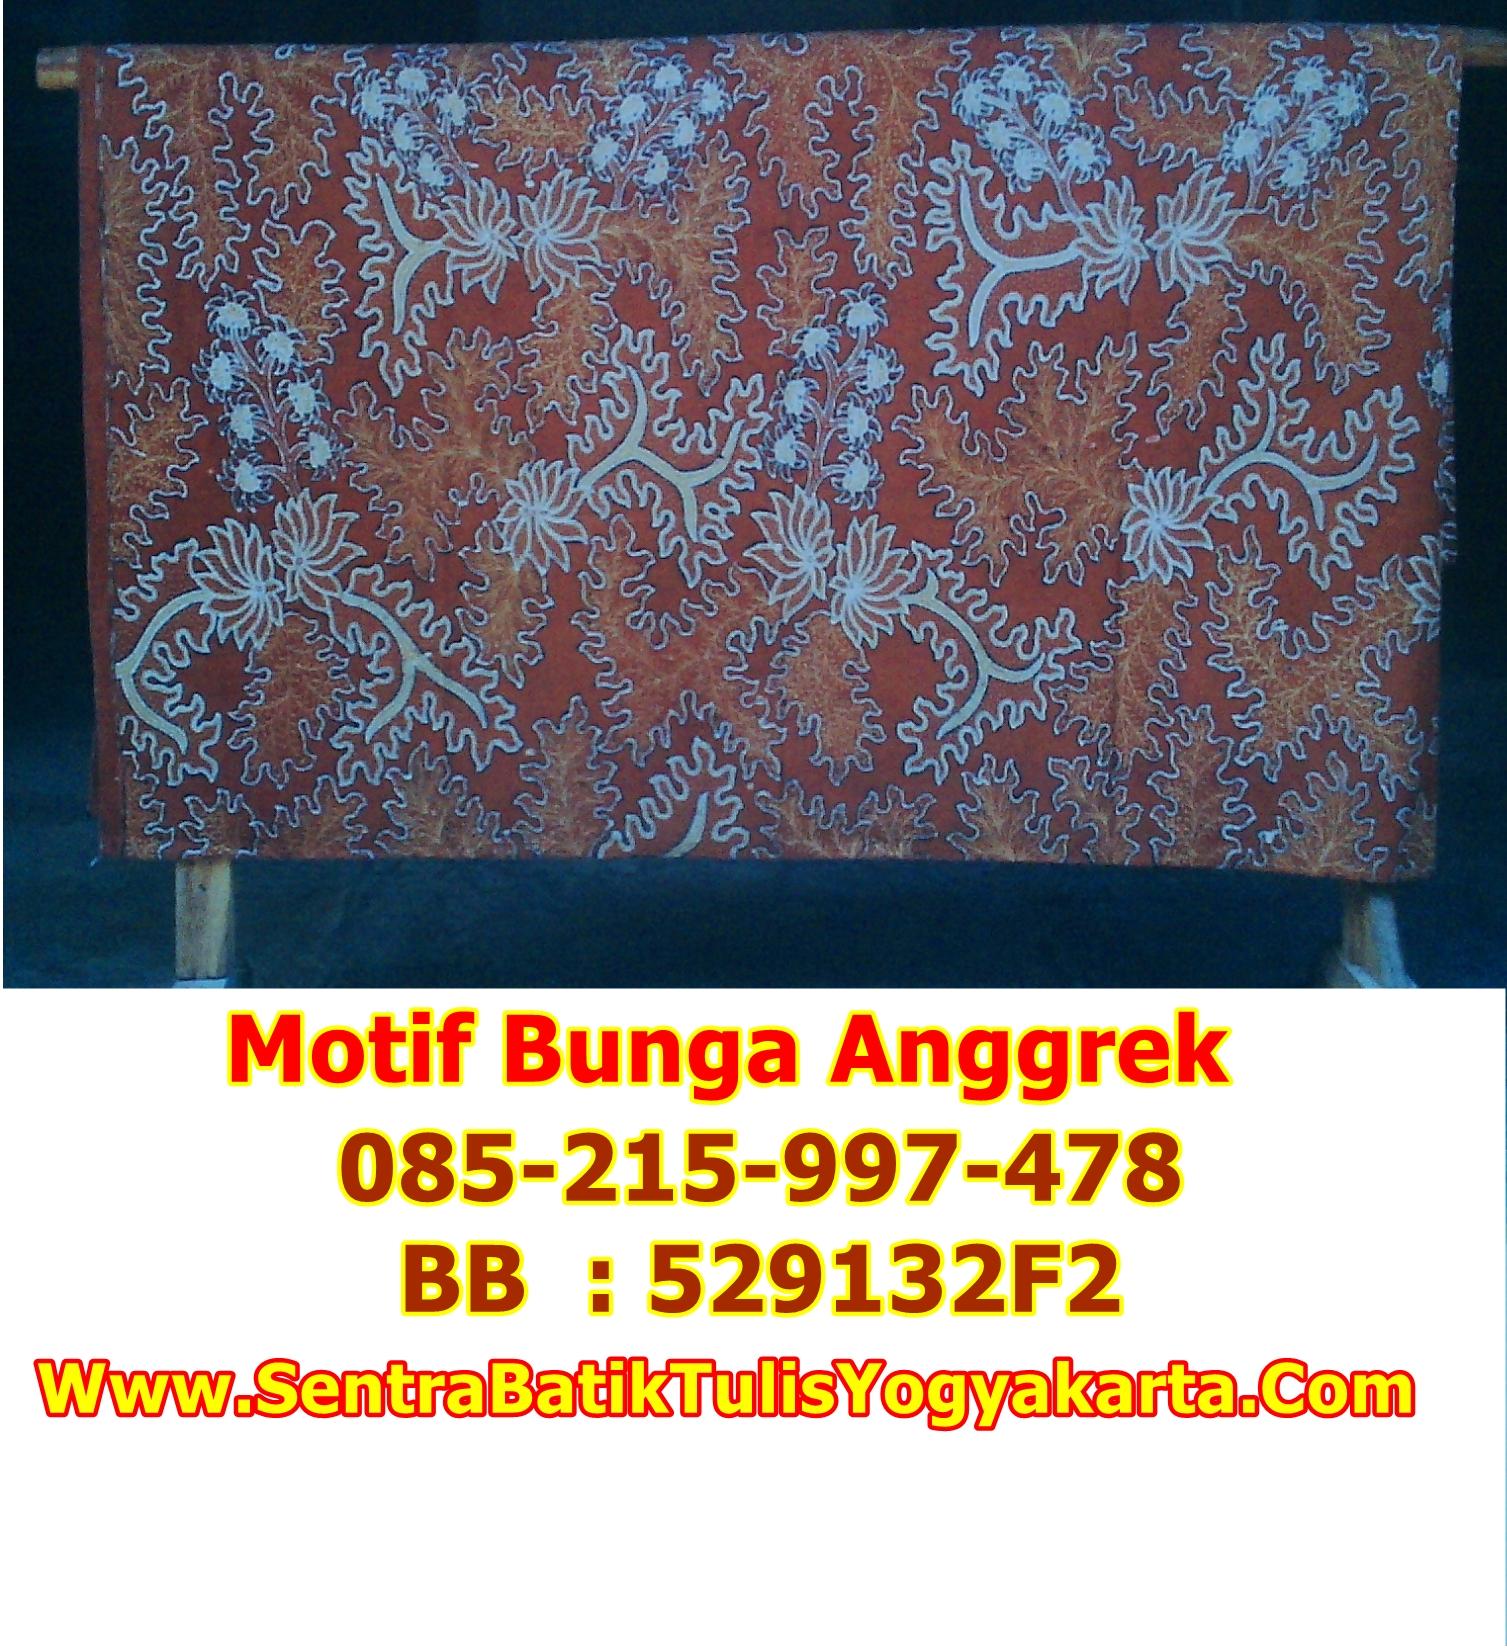 Harga Batik TUlis Giriloyo, Yogyakarta